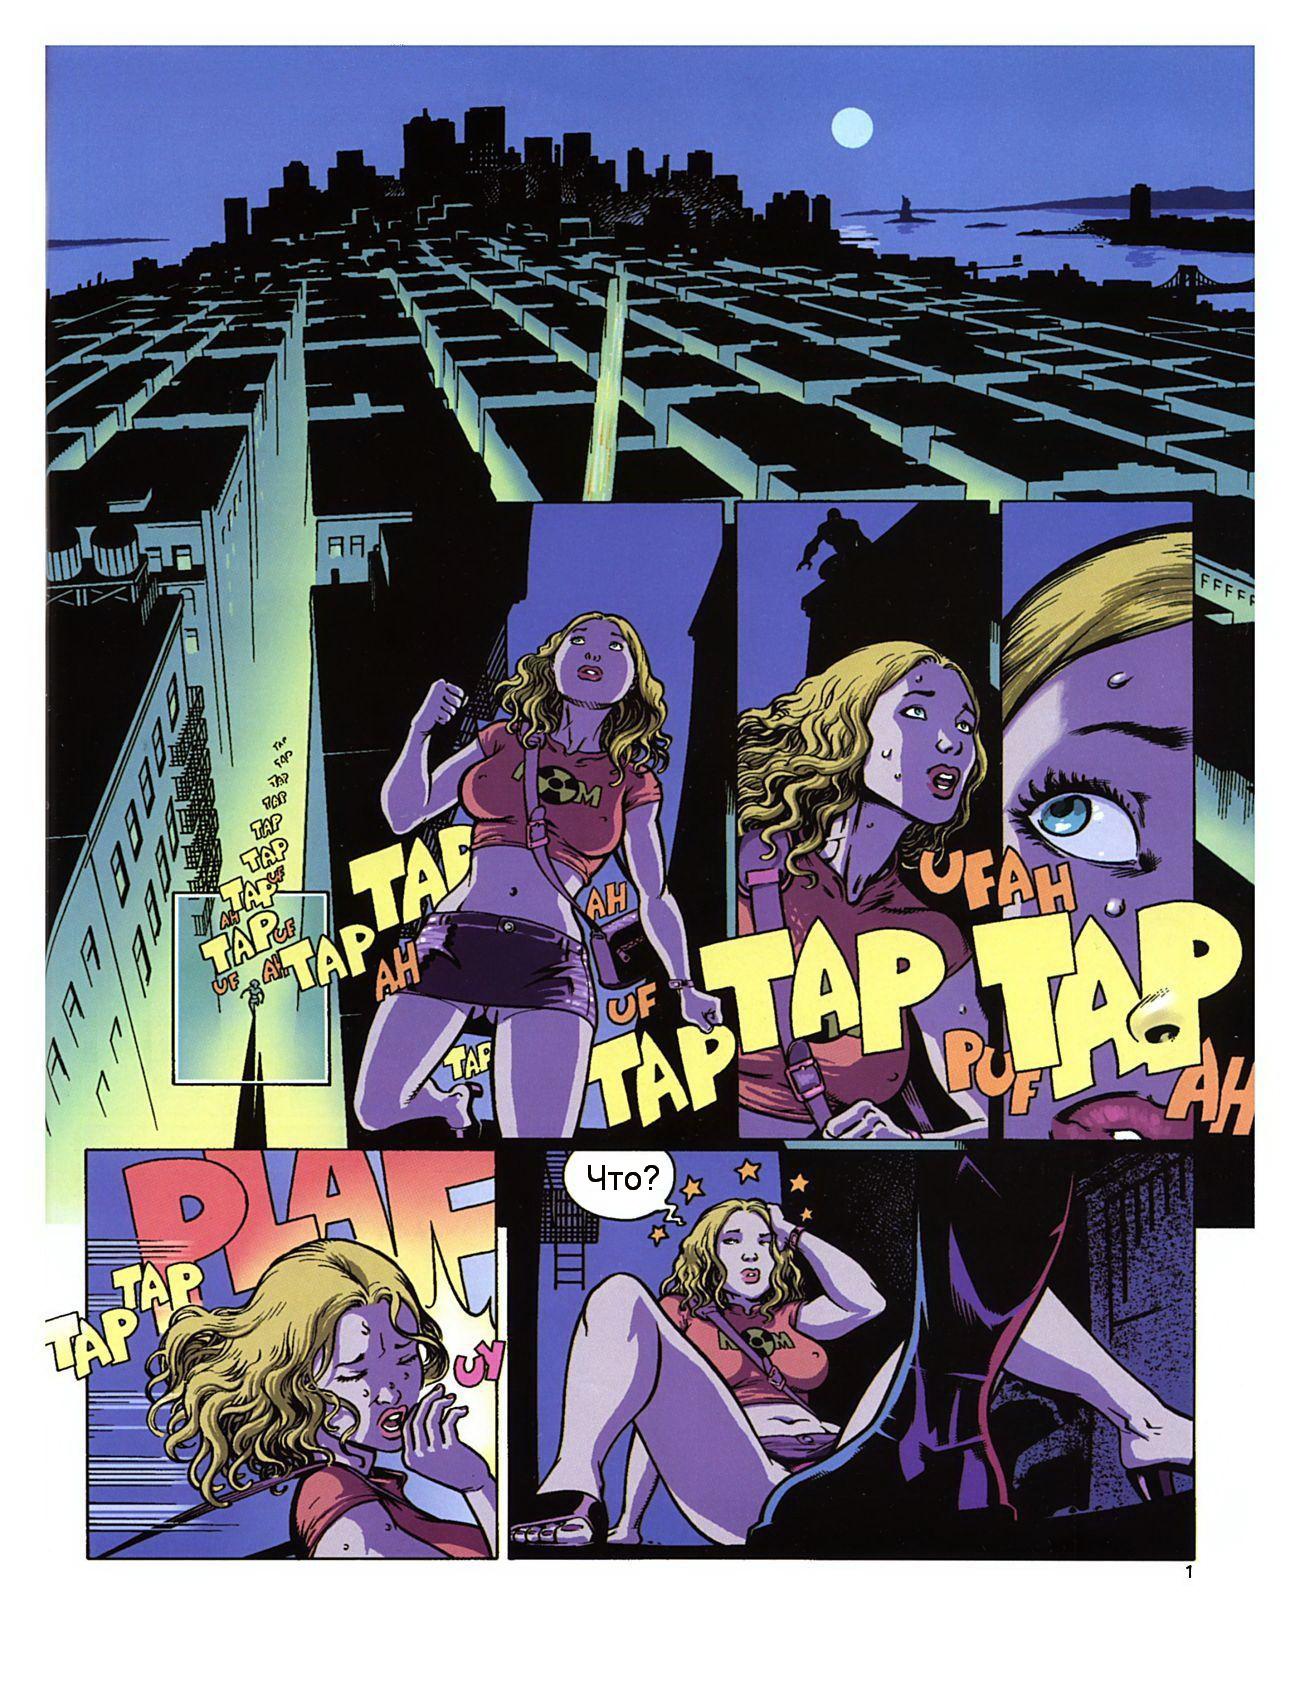 Супергерои Нью-Йорка (NY SuperHeroes) порно комикс